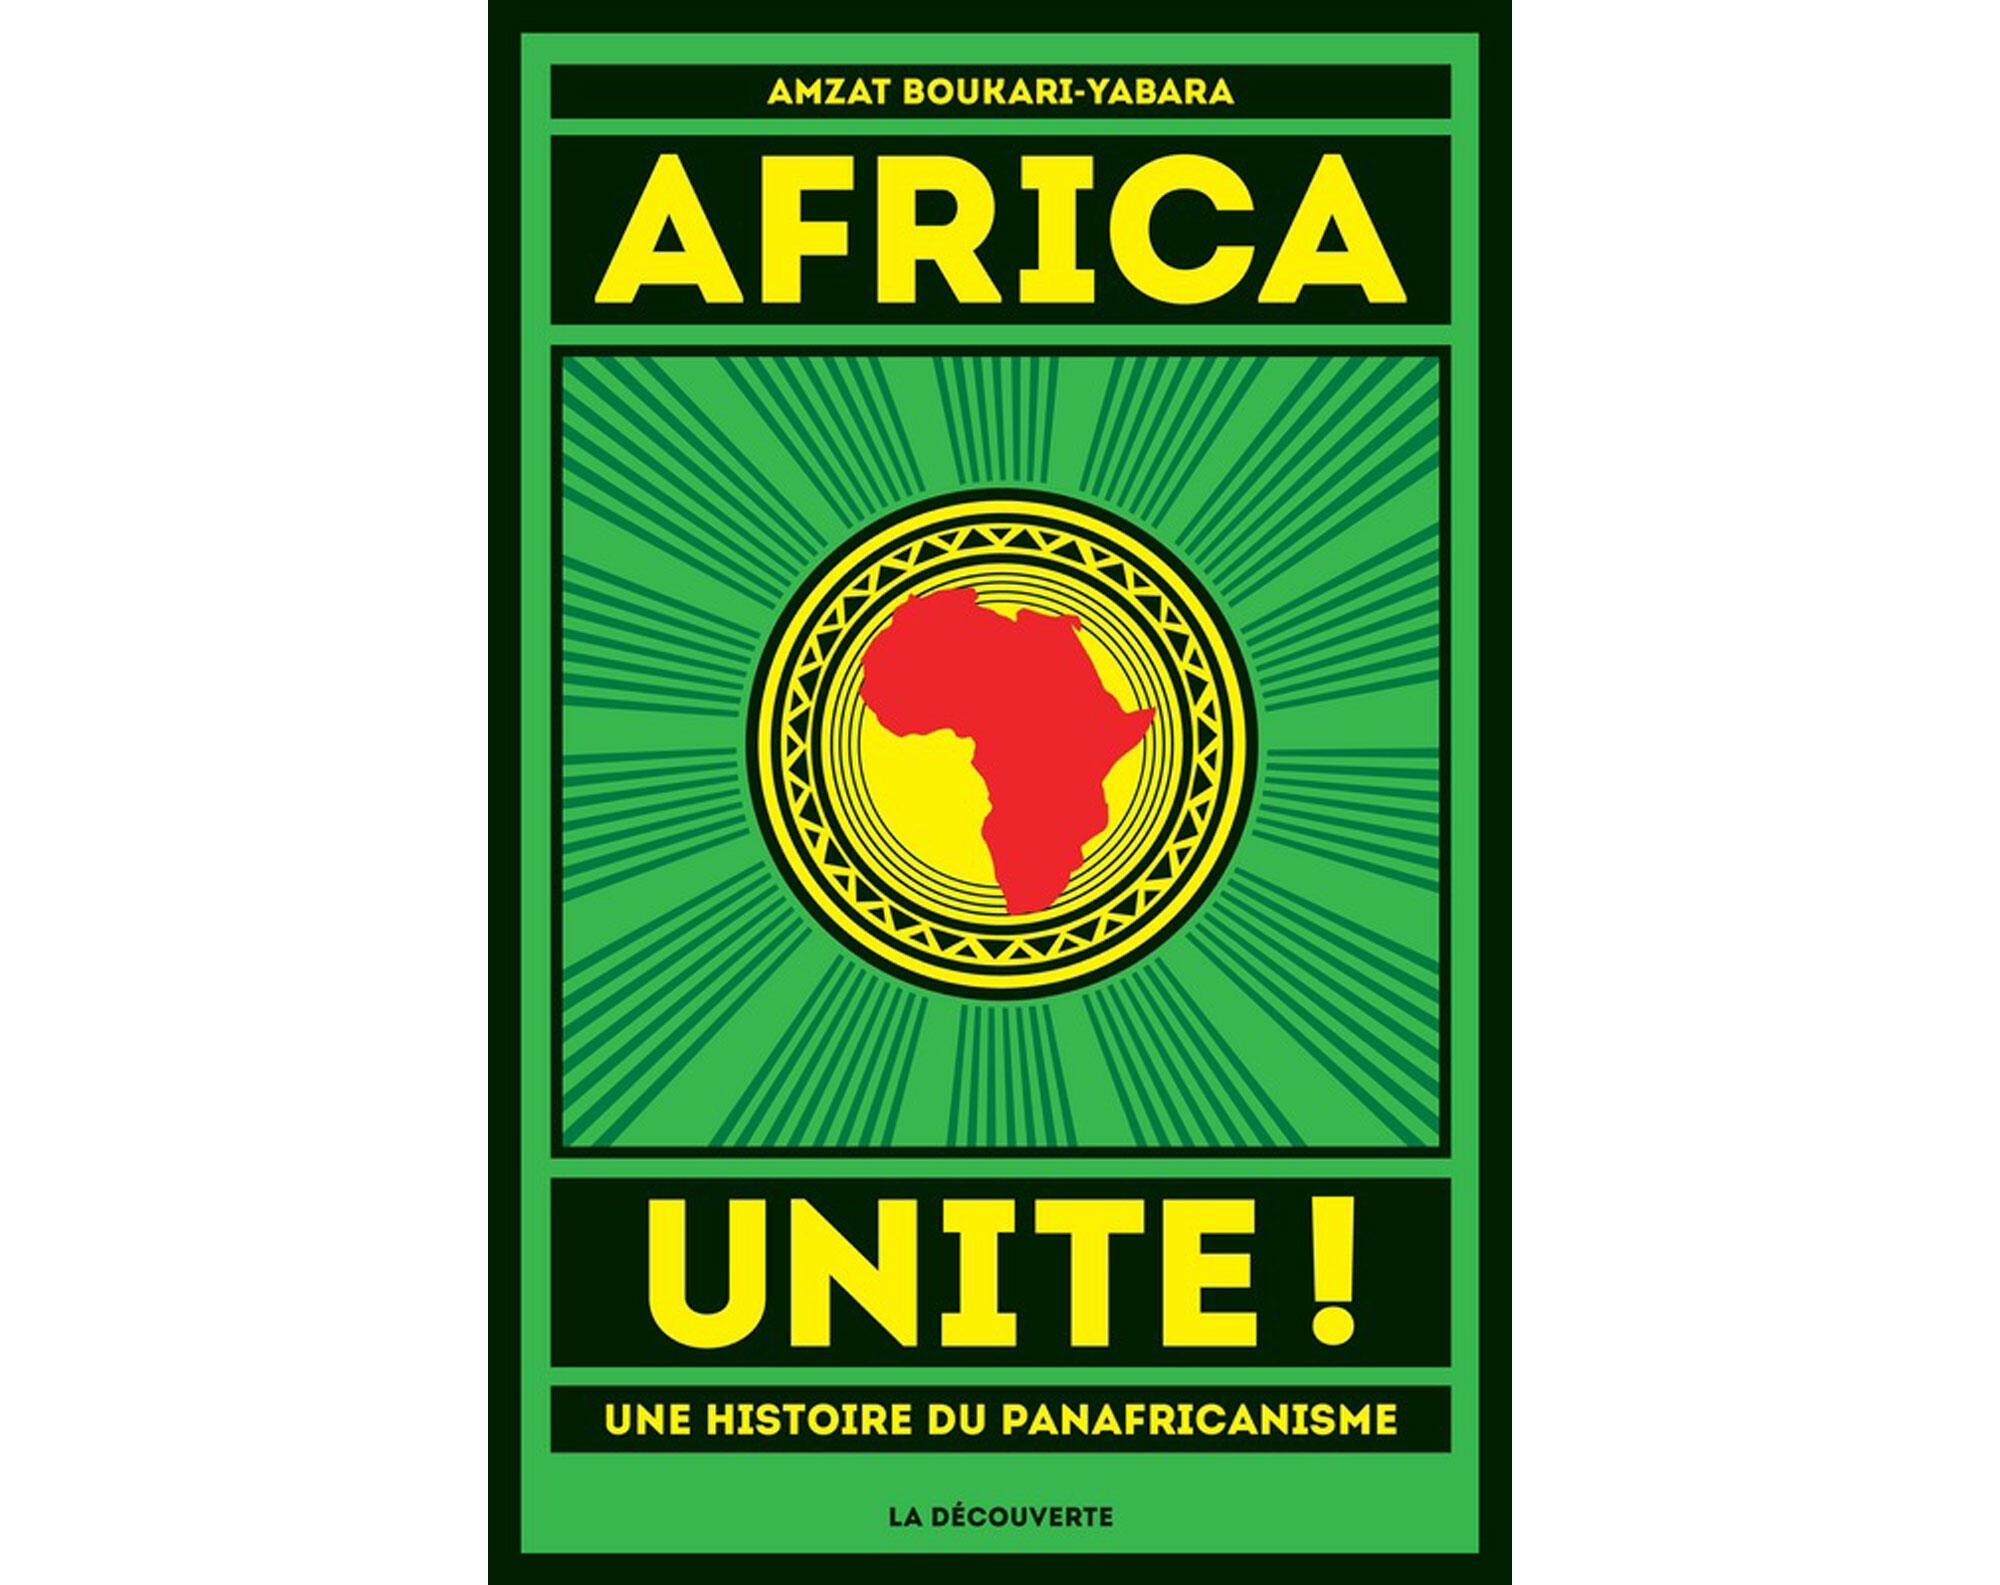 Livre Africa unite de Amzat Boukari-Yabara, editions La Découverte.